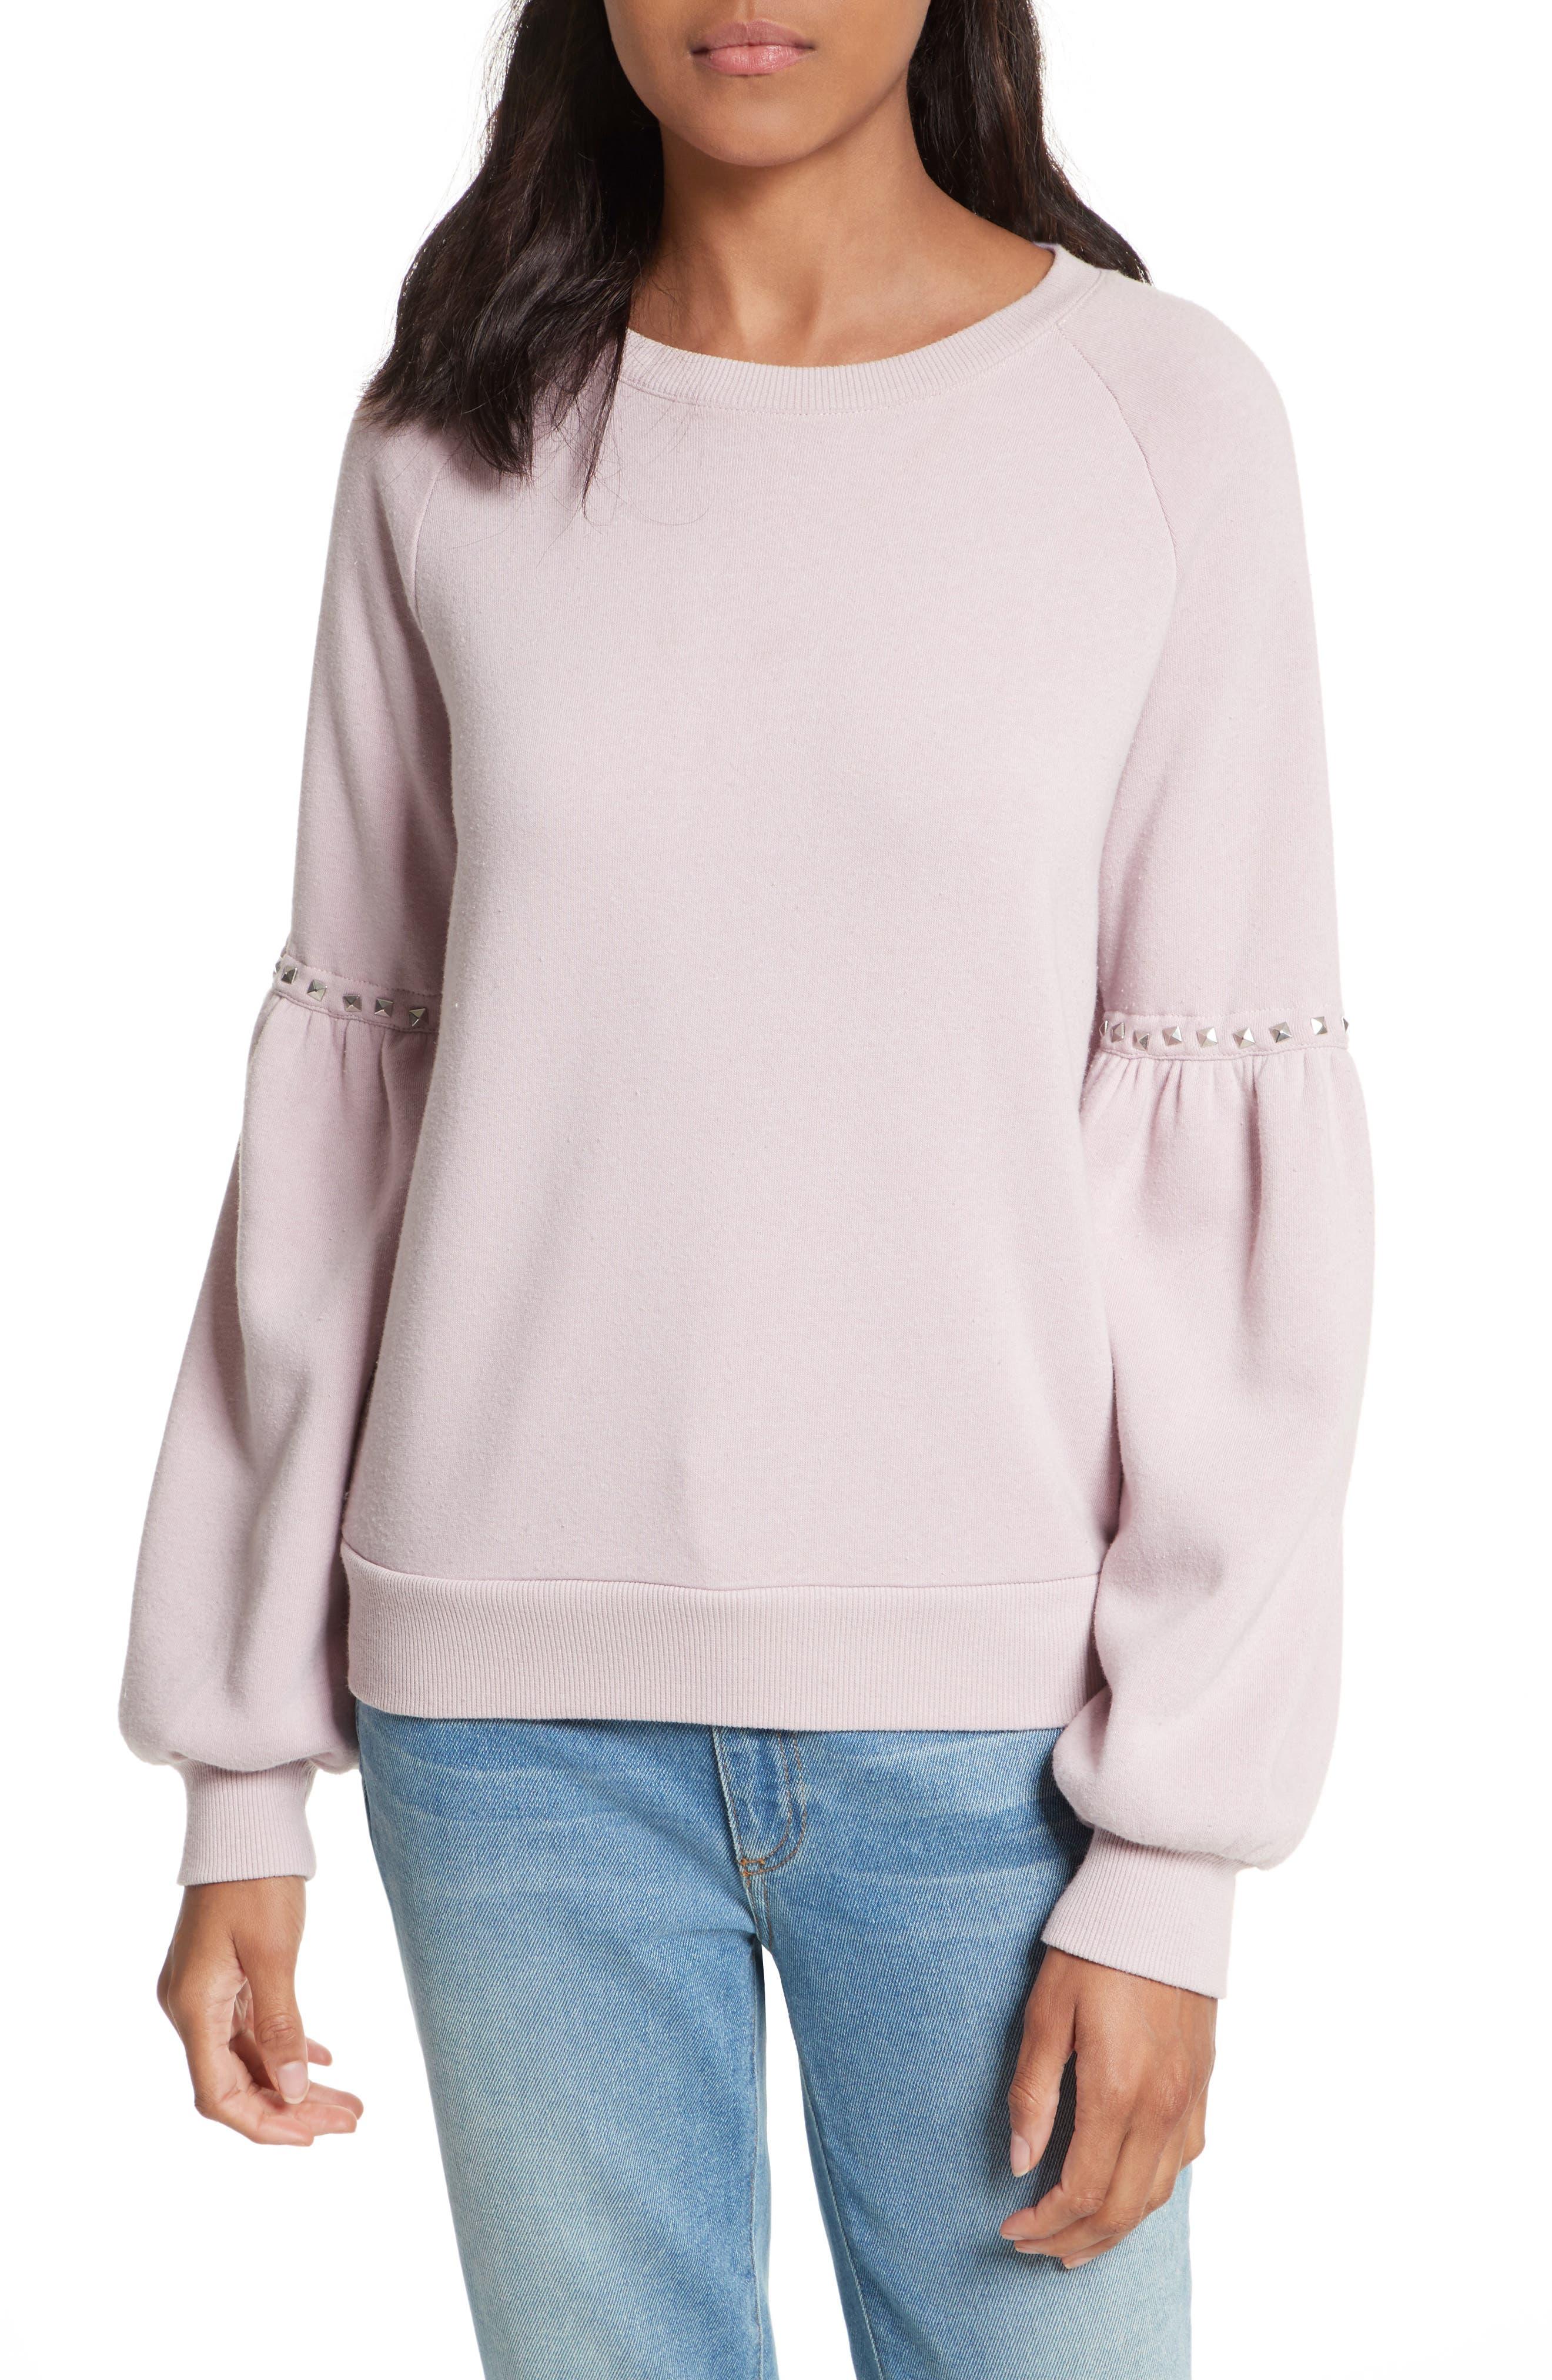 Clementine Sweatshirt,                         Main,                         color, 581